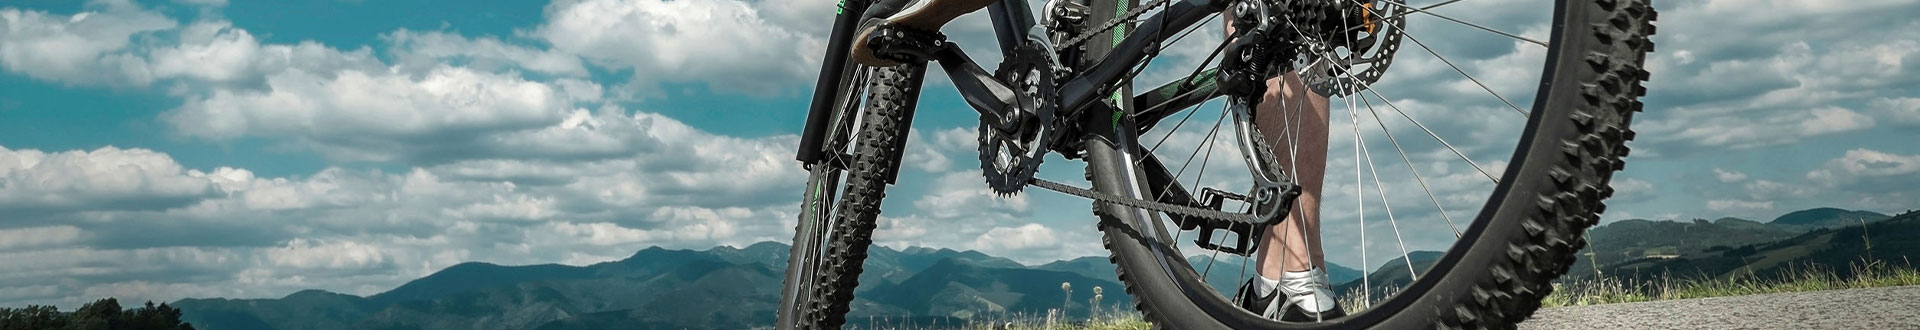 Mountainbikes - Sport Globe